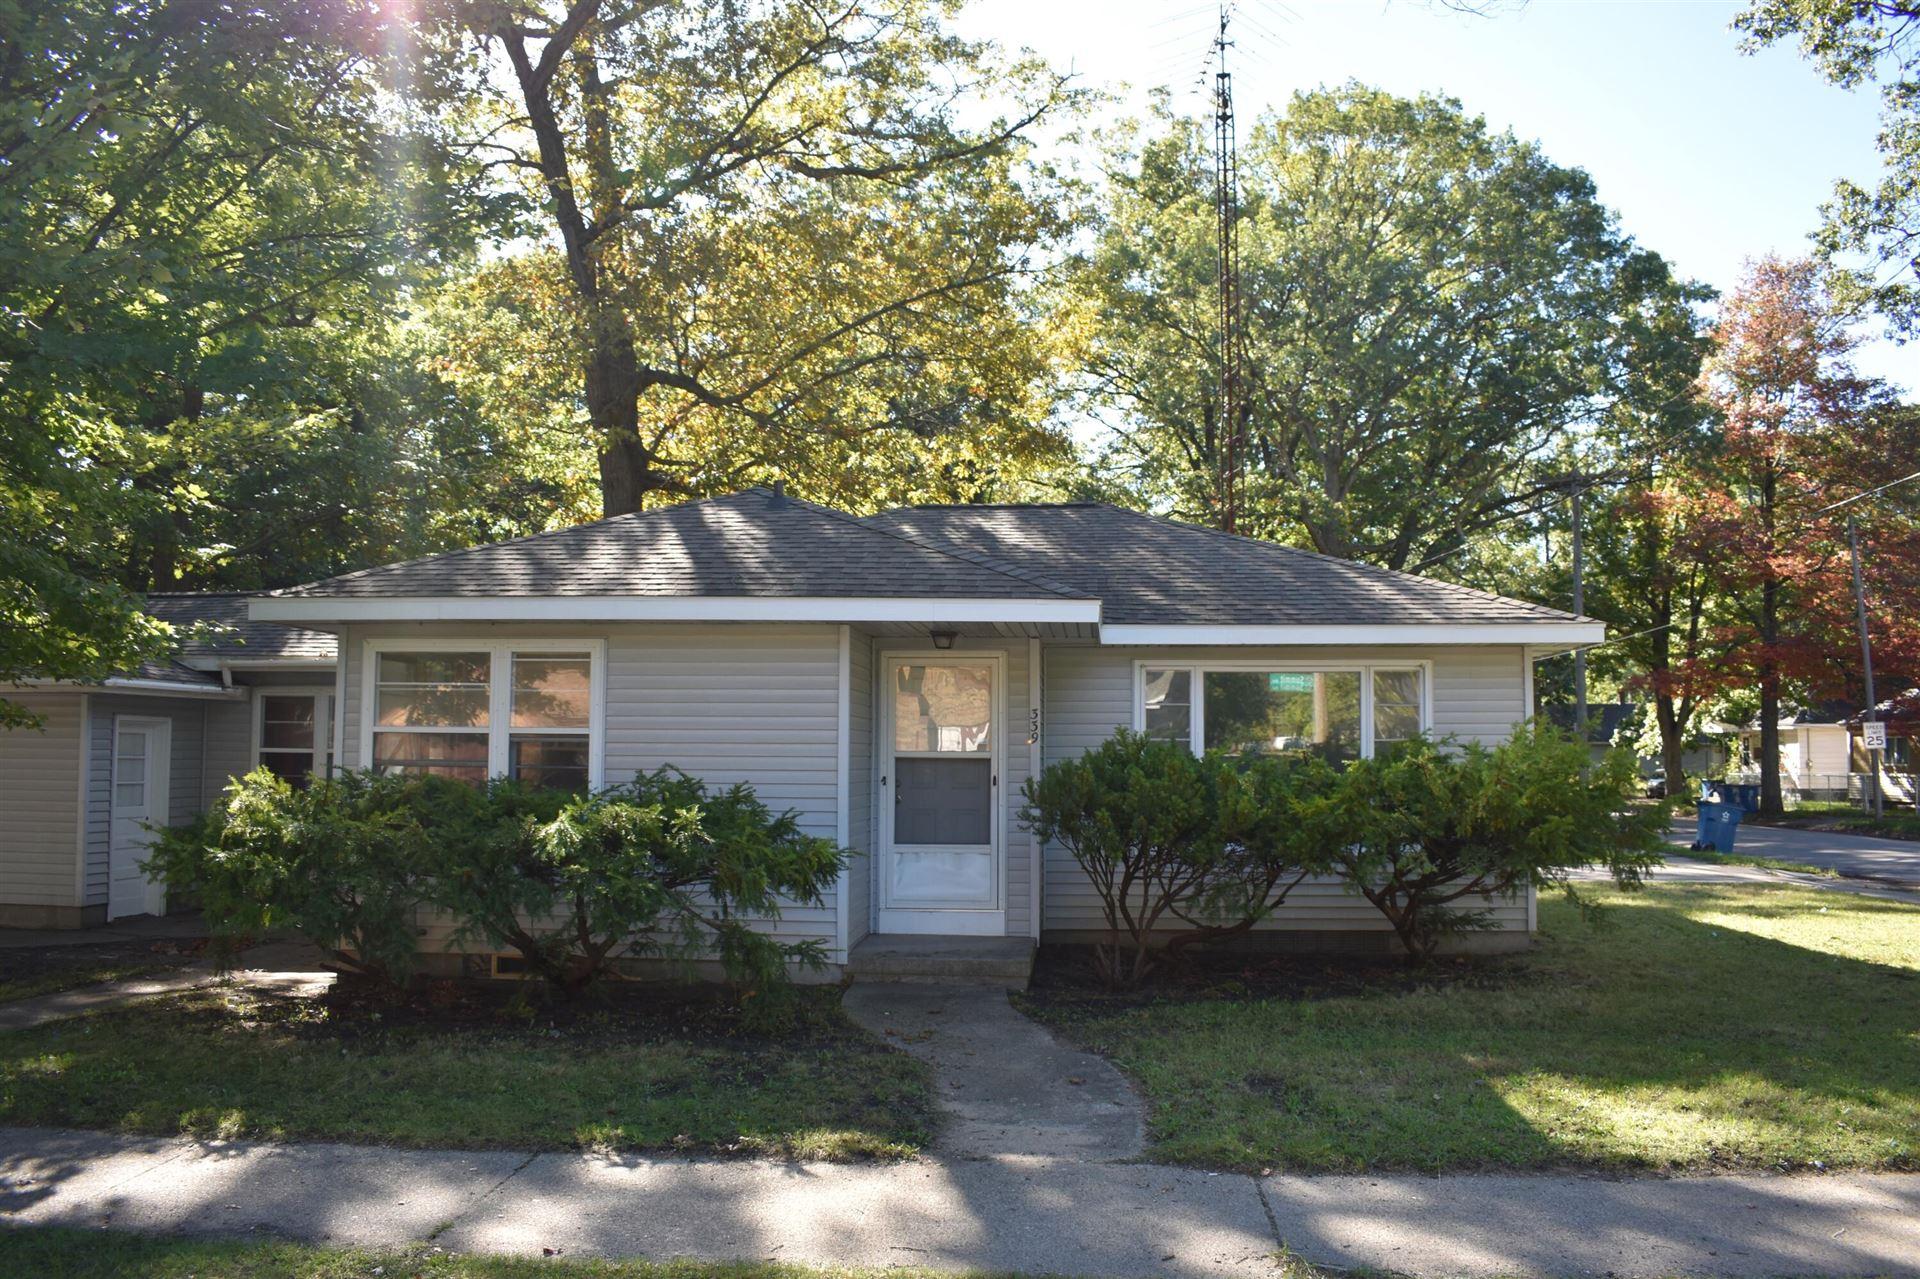 339 W Summit Avenue, Muskegon Heights, MI 49444 - MLS#: 21111310